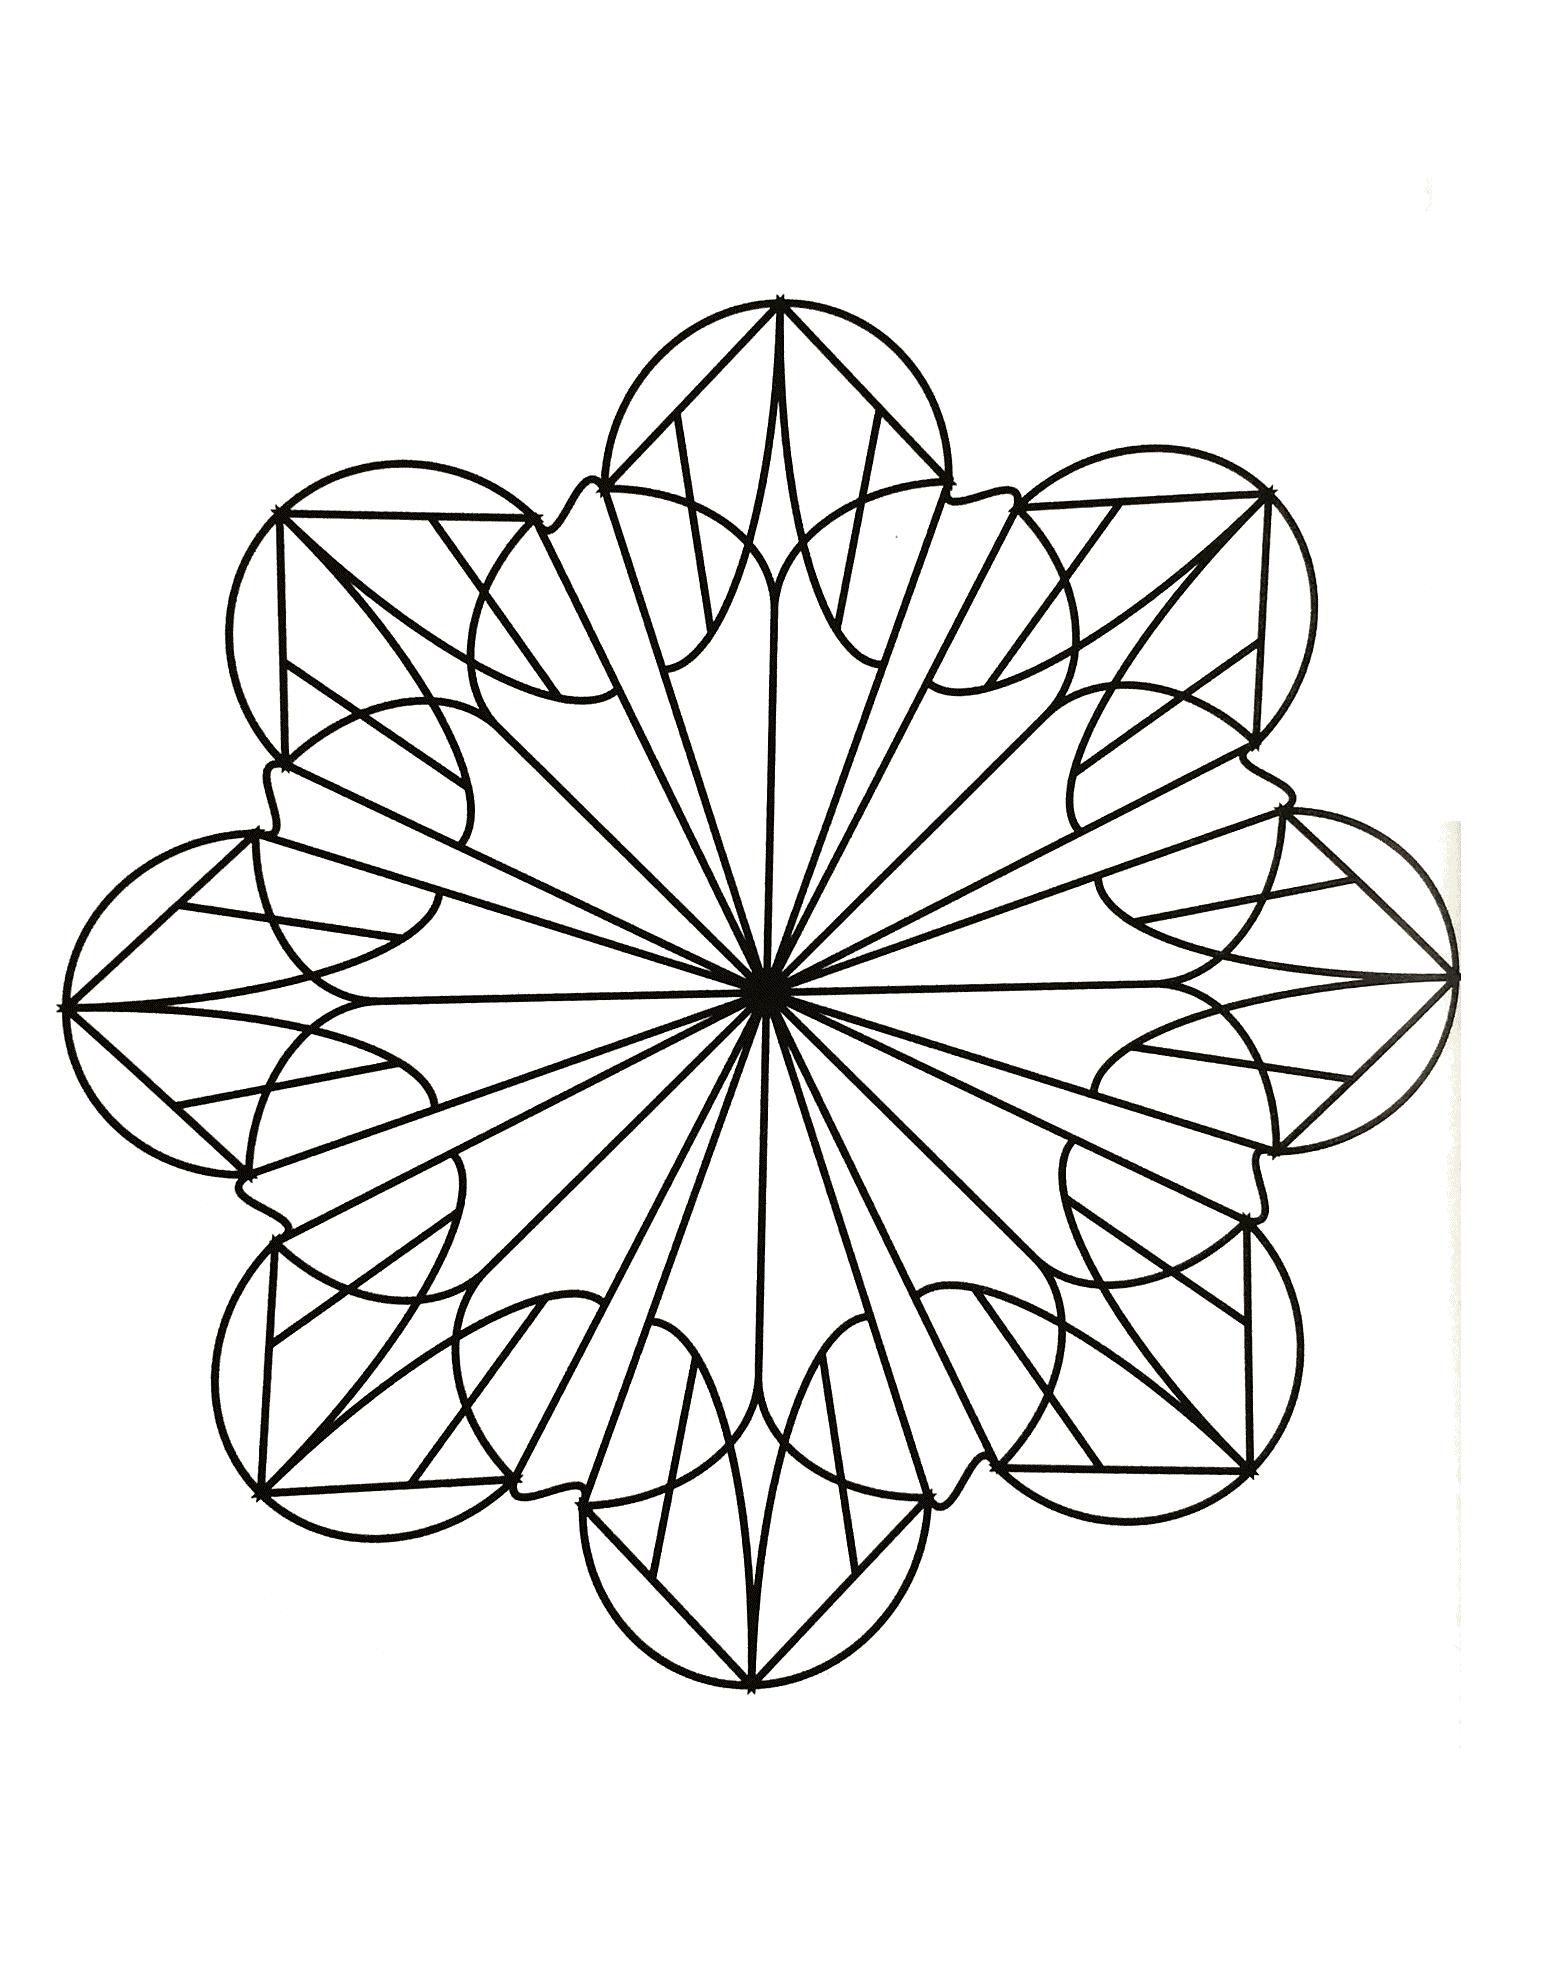 Mandalas coloring page to download